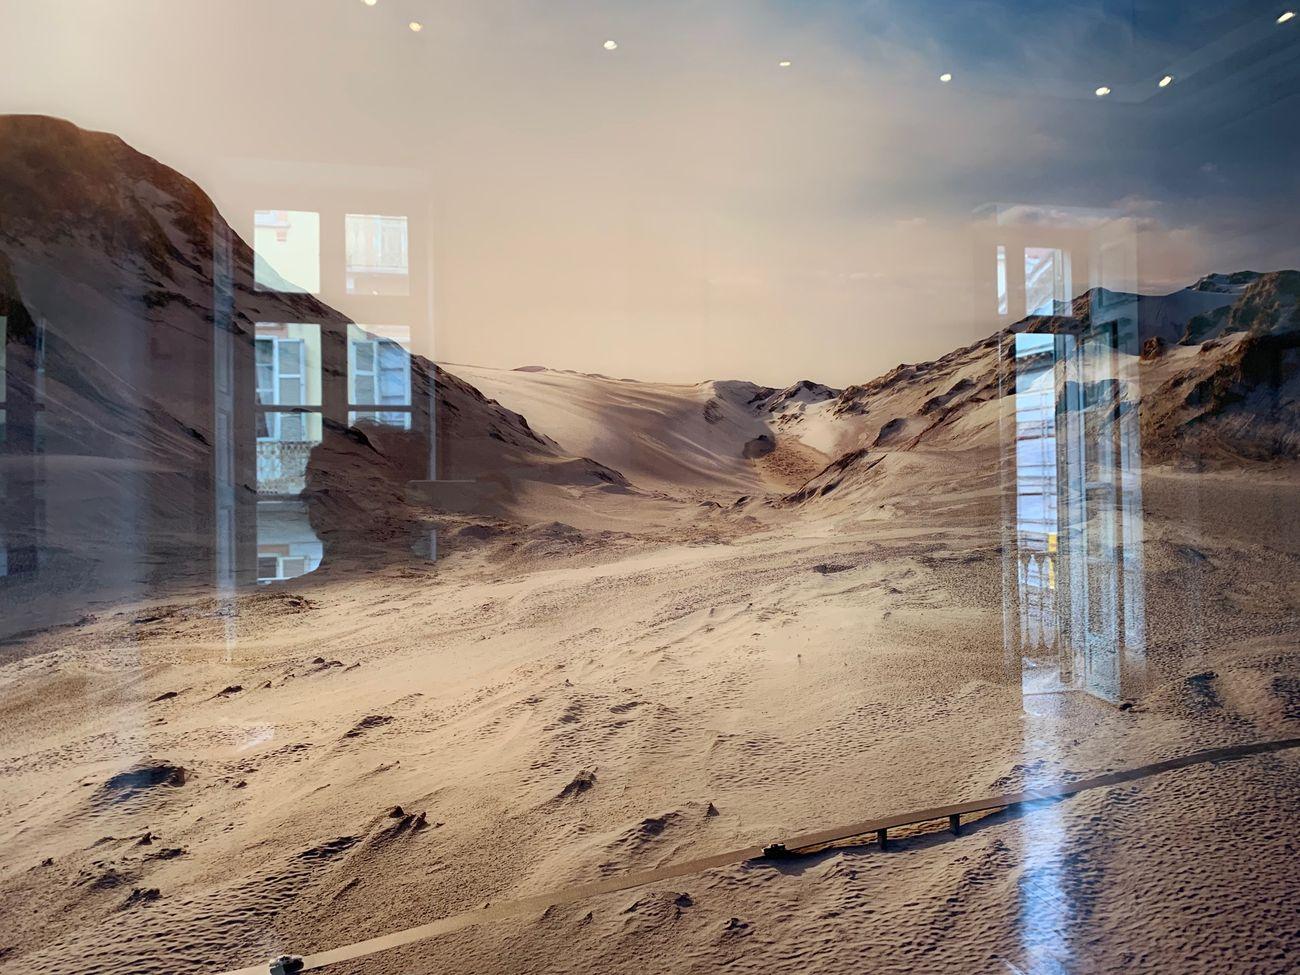 Thomas Wrede. Real Landscapes. Installation view at Photo&Contemporary, Torino 2020. Photo Nicola Davide Angerame